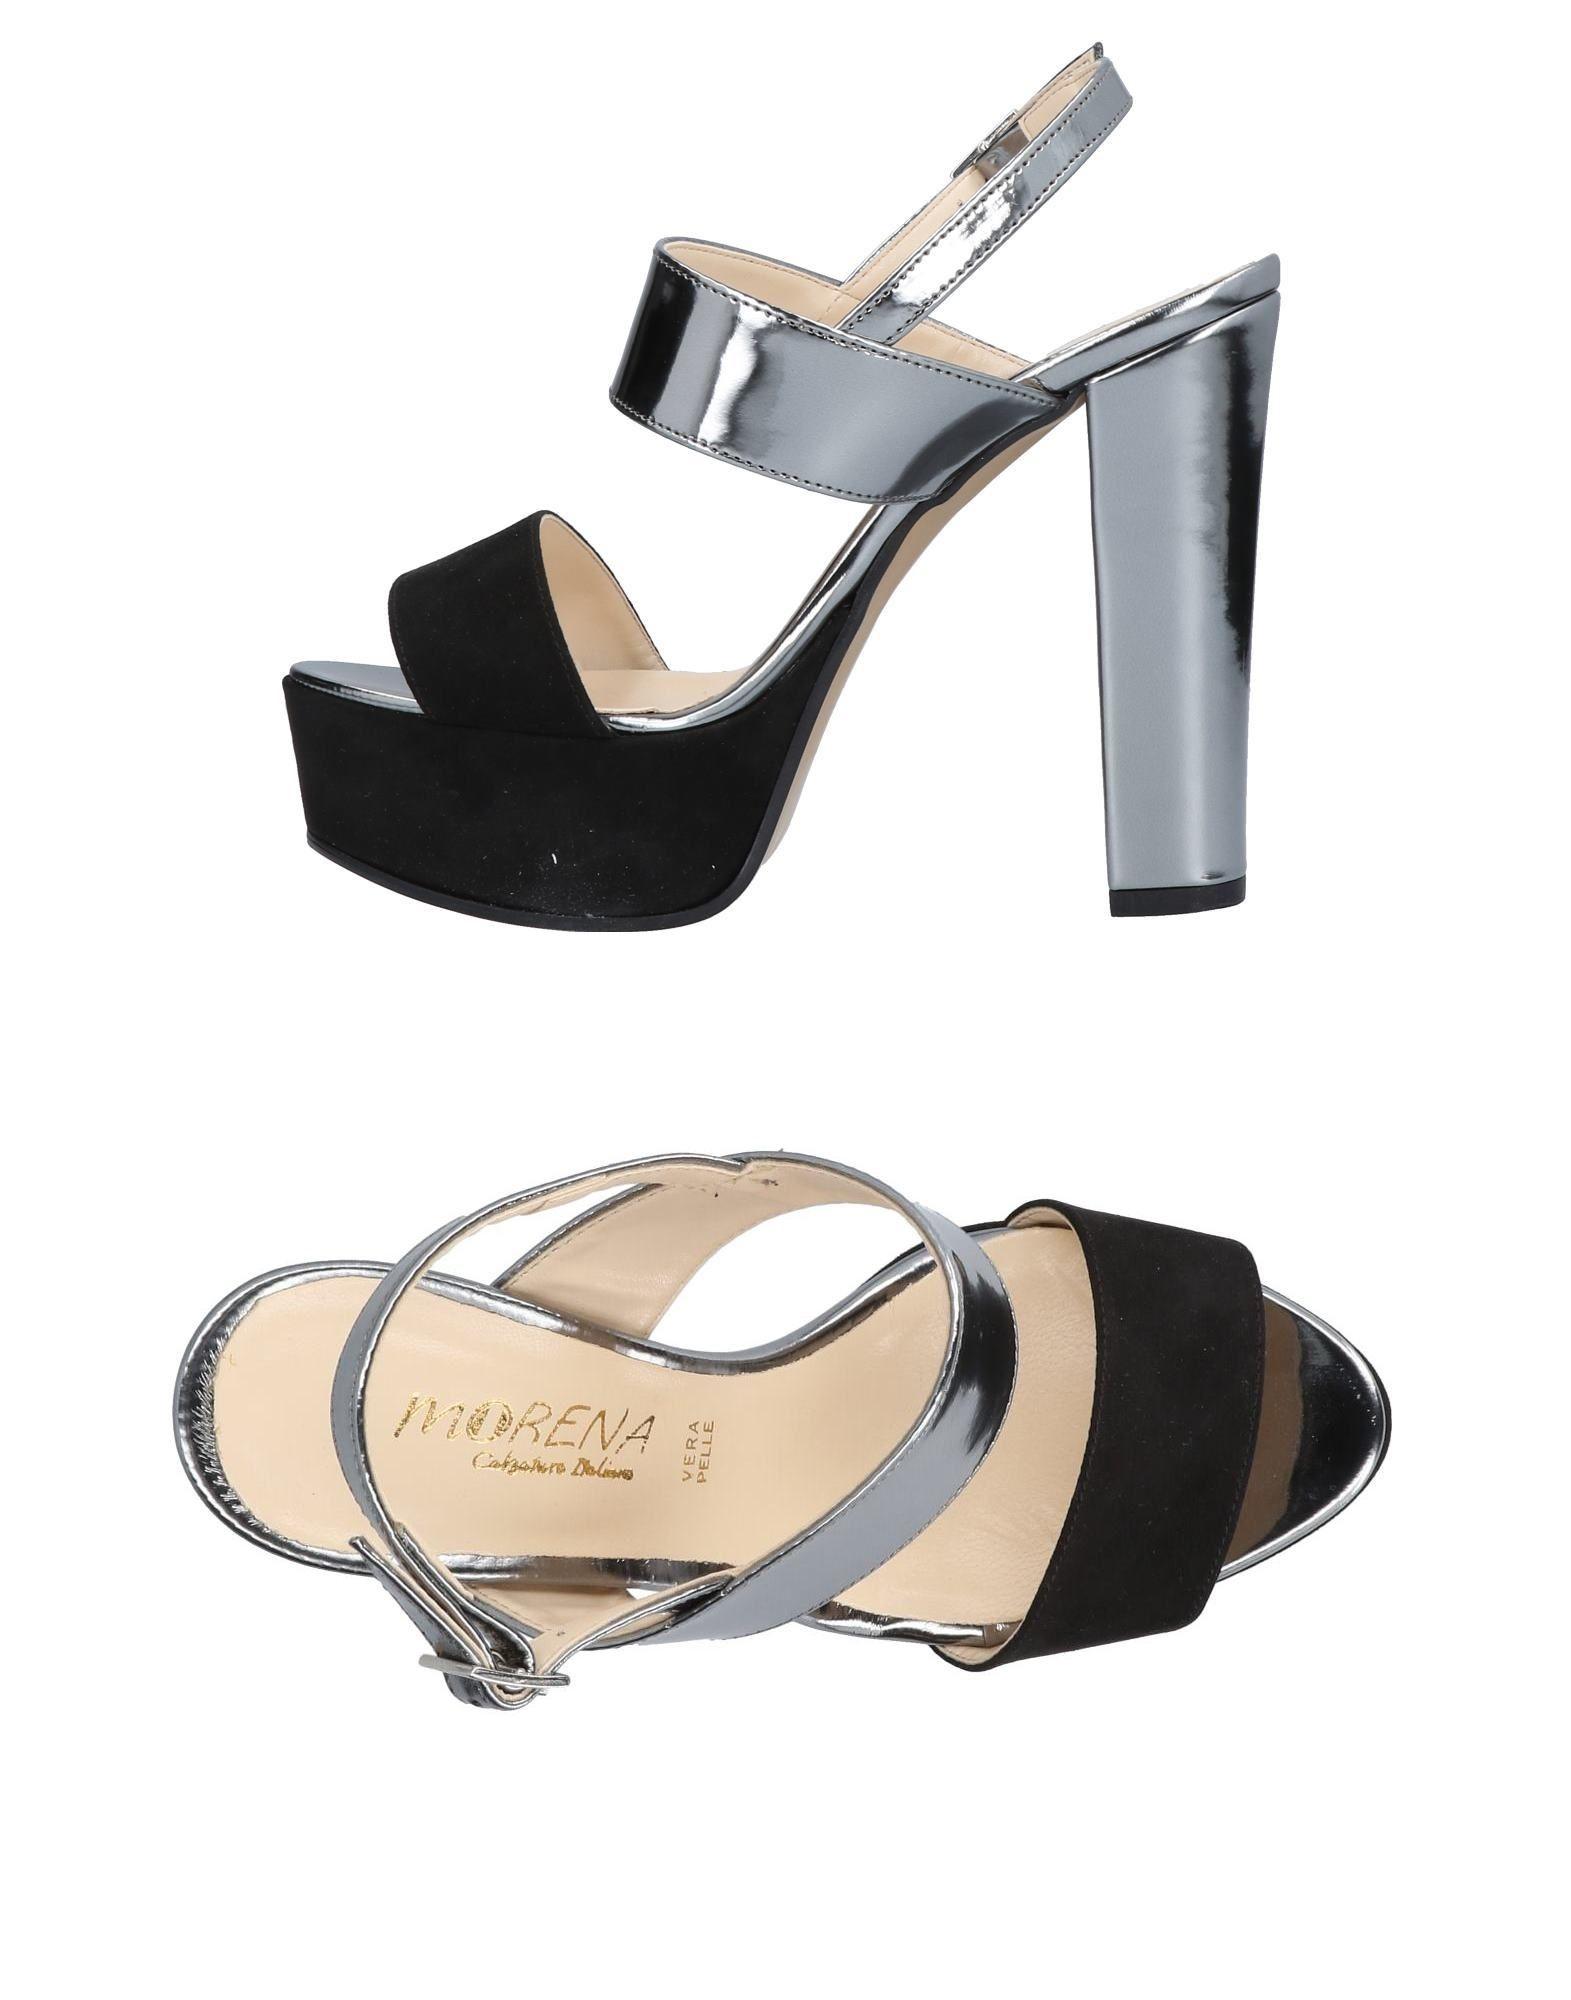 Morena Calzature Morena Italiane Sandals - Women Morena Calzature Calzature Italiane Sandals online on  Australia - 11462888FL 2a5ced